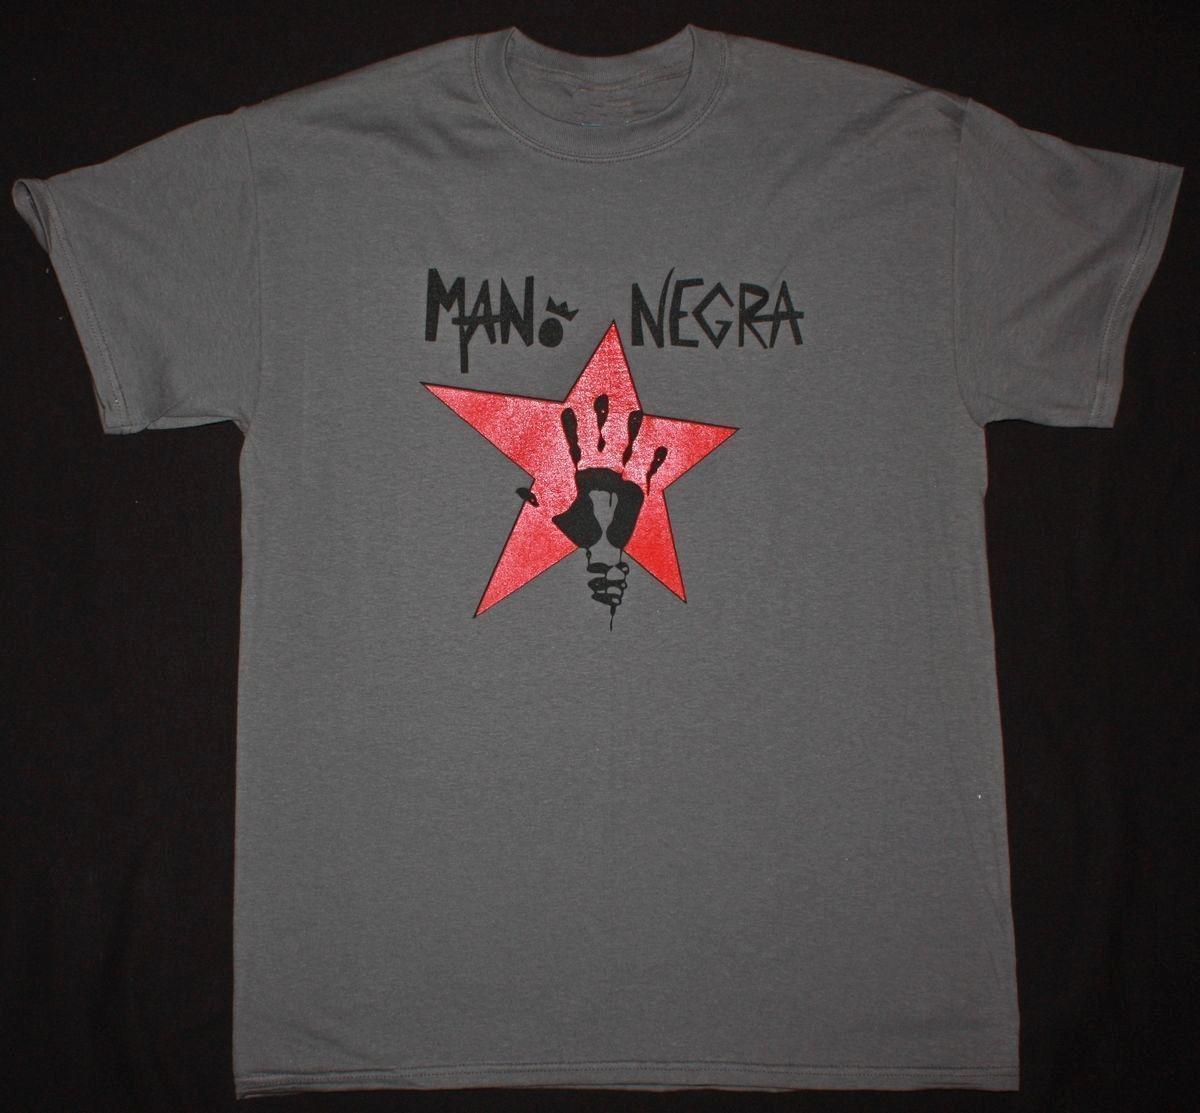 4a8665a975396 MANO NEGRA KING OF BONGO SKA PUNK MALA VIDA HOT PANTS MANU CHAO NEW GREY T  SHIRT Funny Unisex Casual Tshirt Top On T Shirt Tourist Shirts From  Mvptshirt